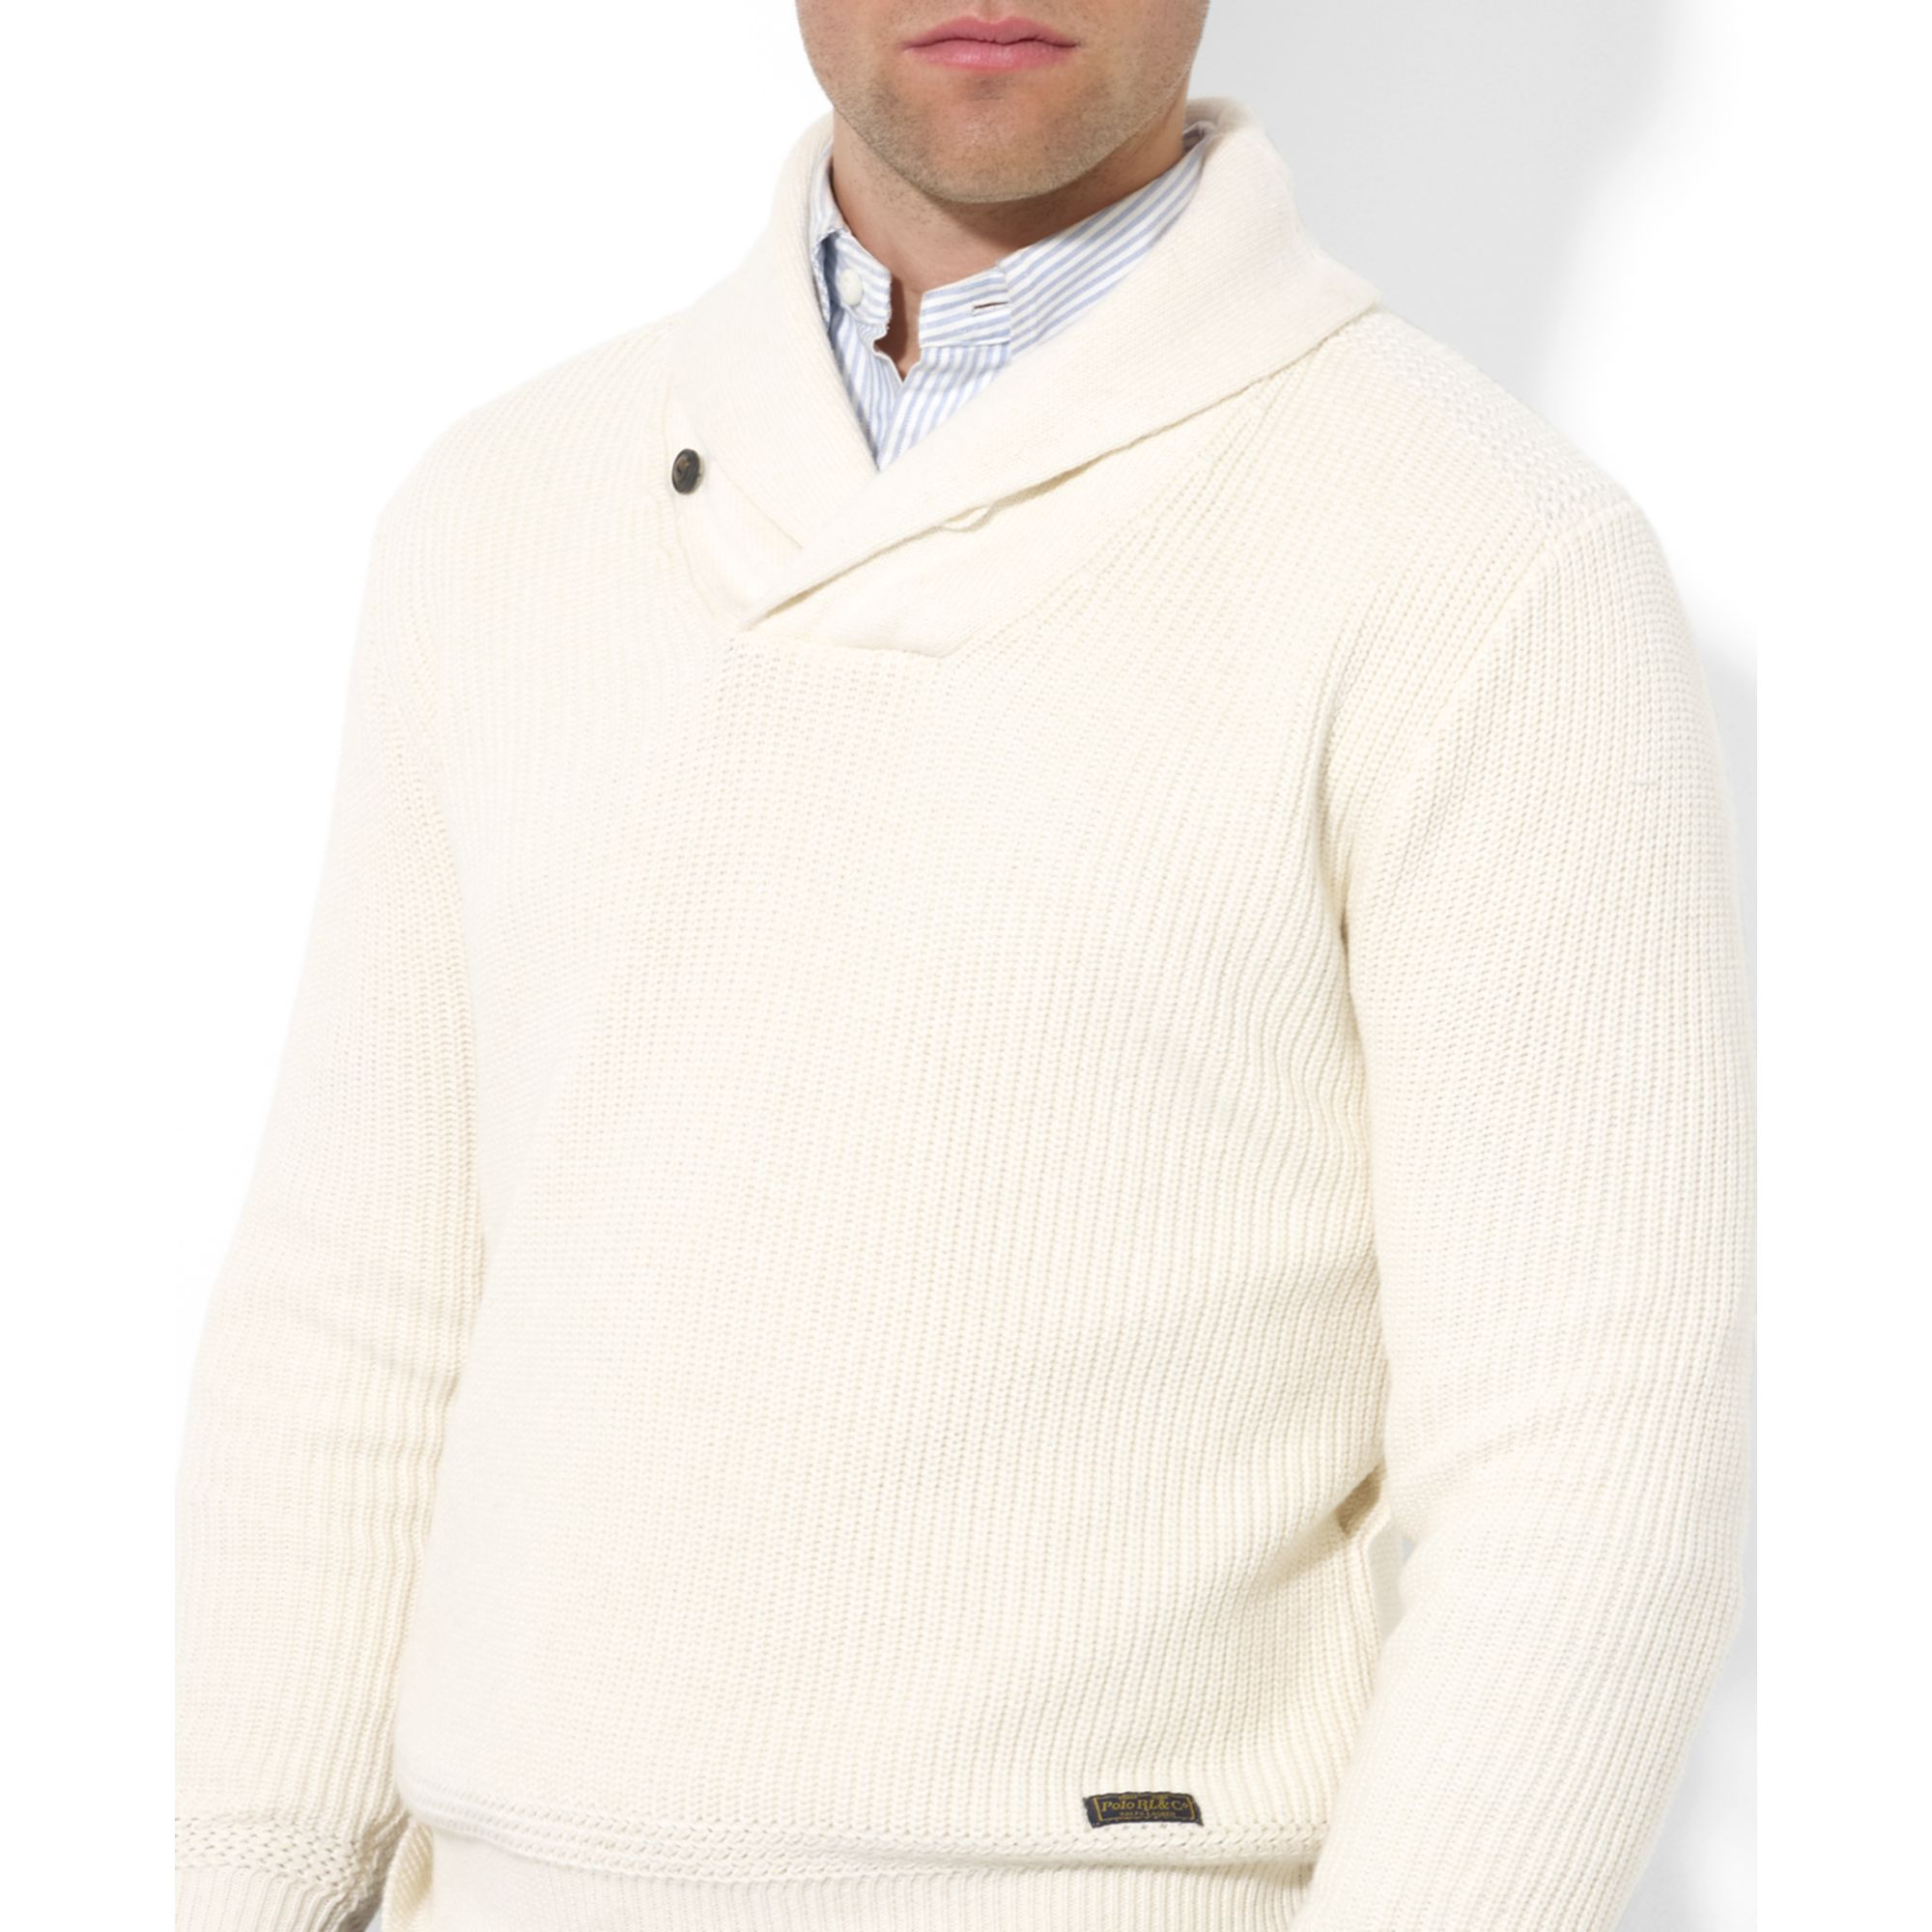 Ralph lauren Shawl Collar Cotton Sweater in Natural for Men | Lyst